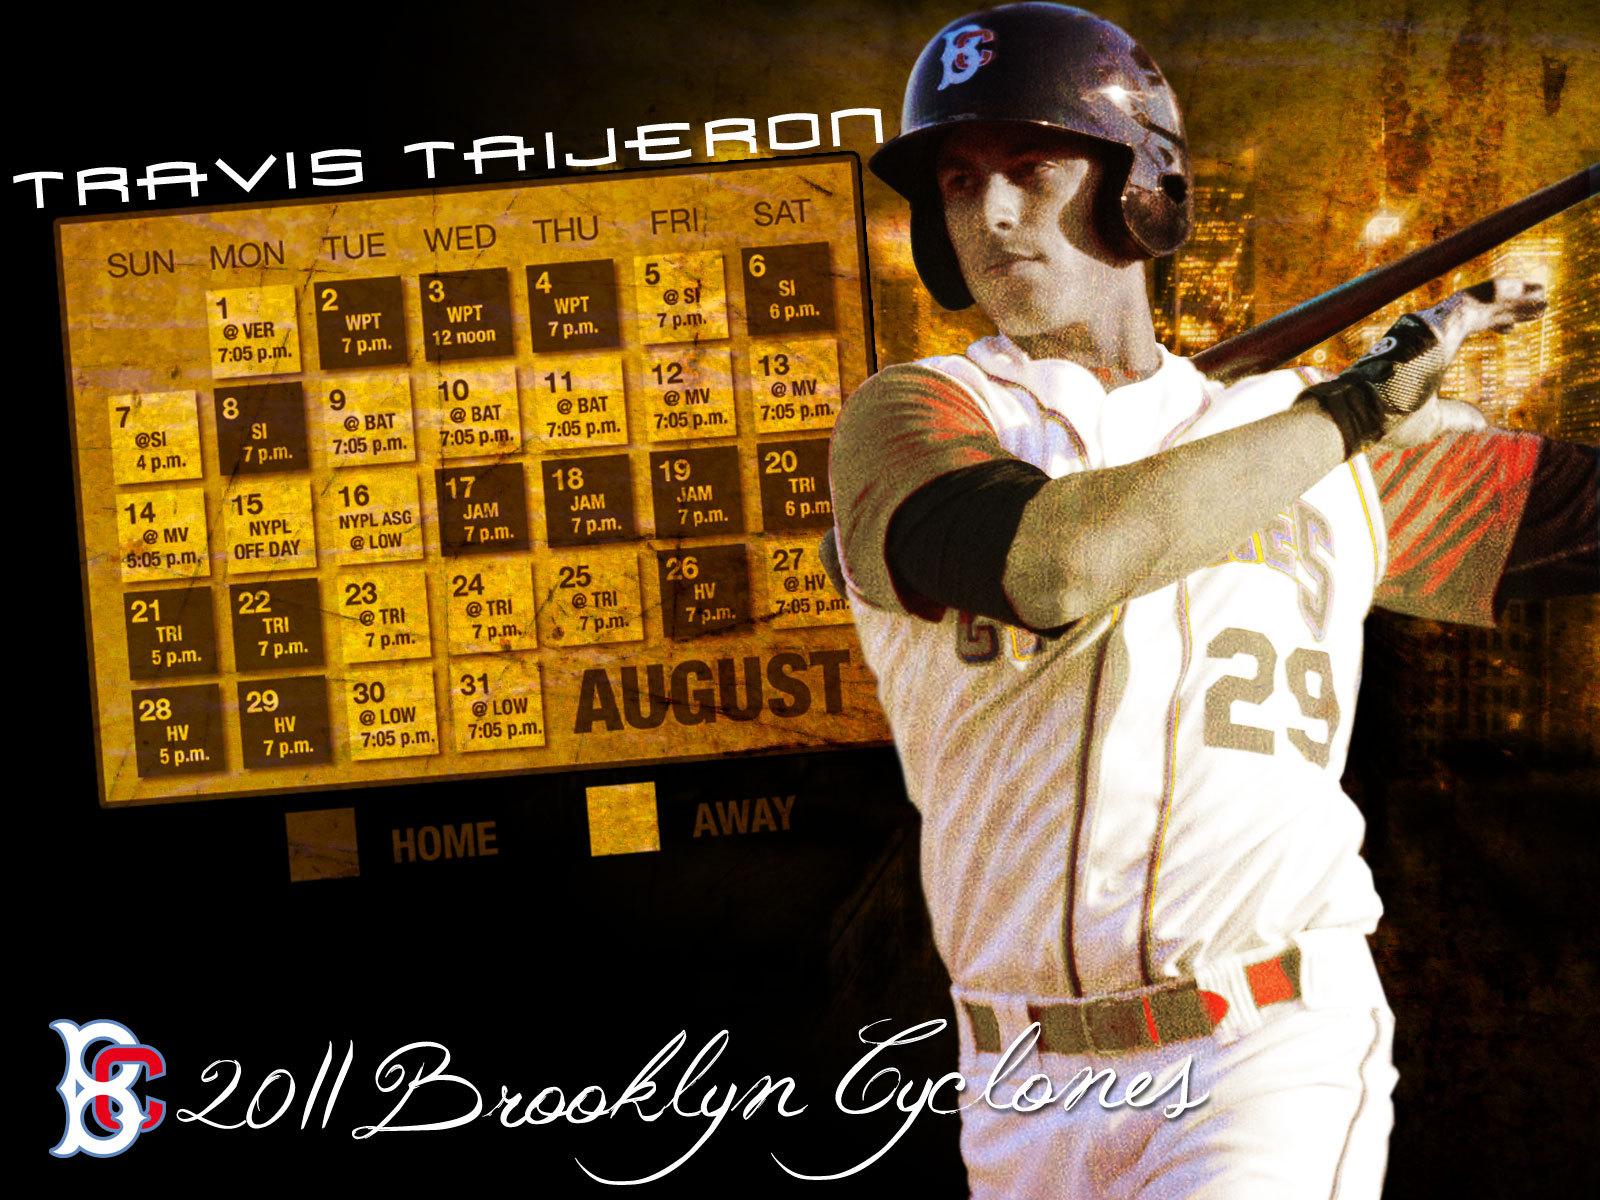 Get To Know Mets Prospect Travis Taijeron